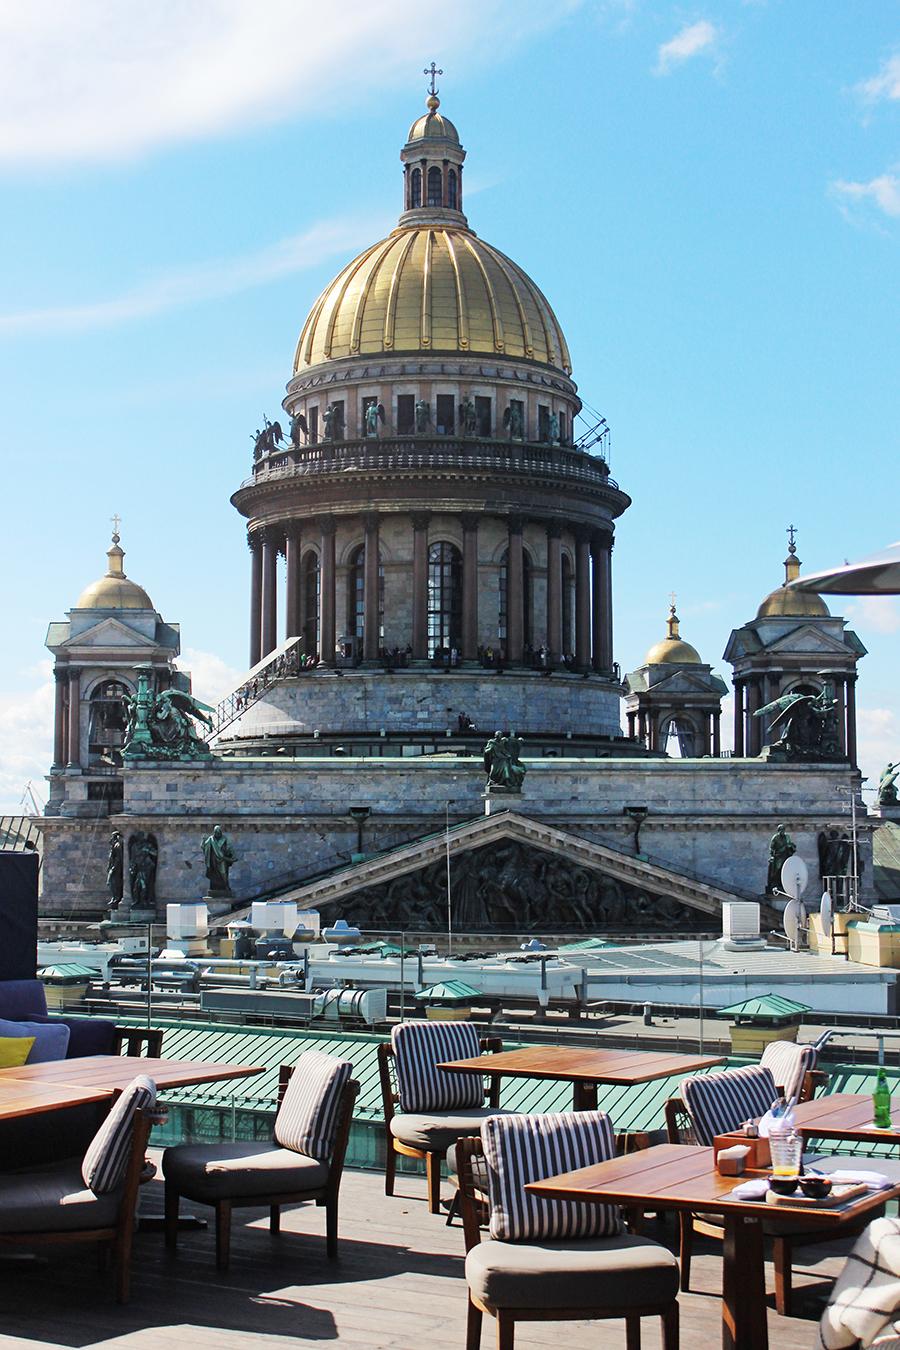 W Hotel St Petersburg, Russia